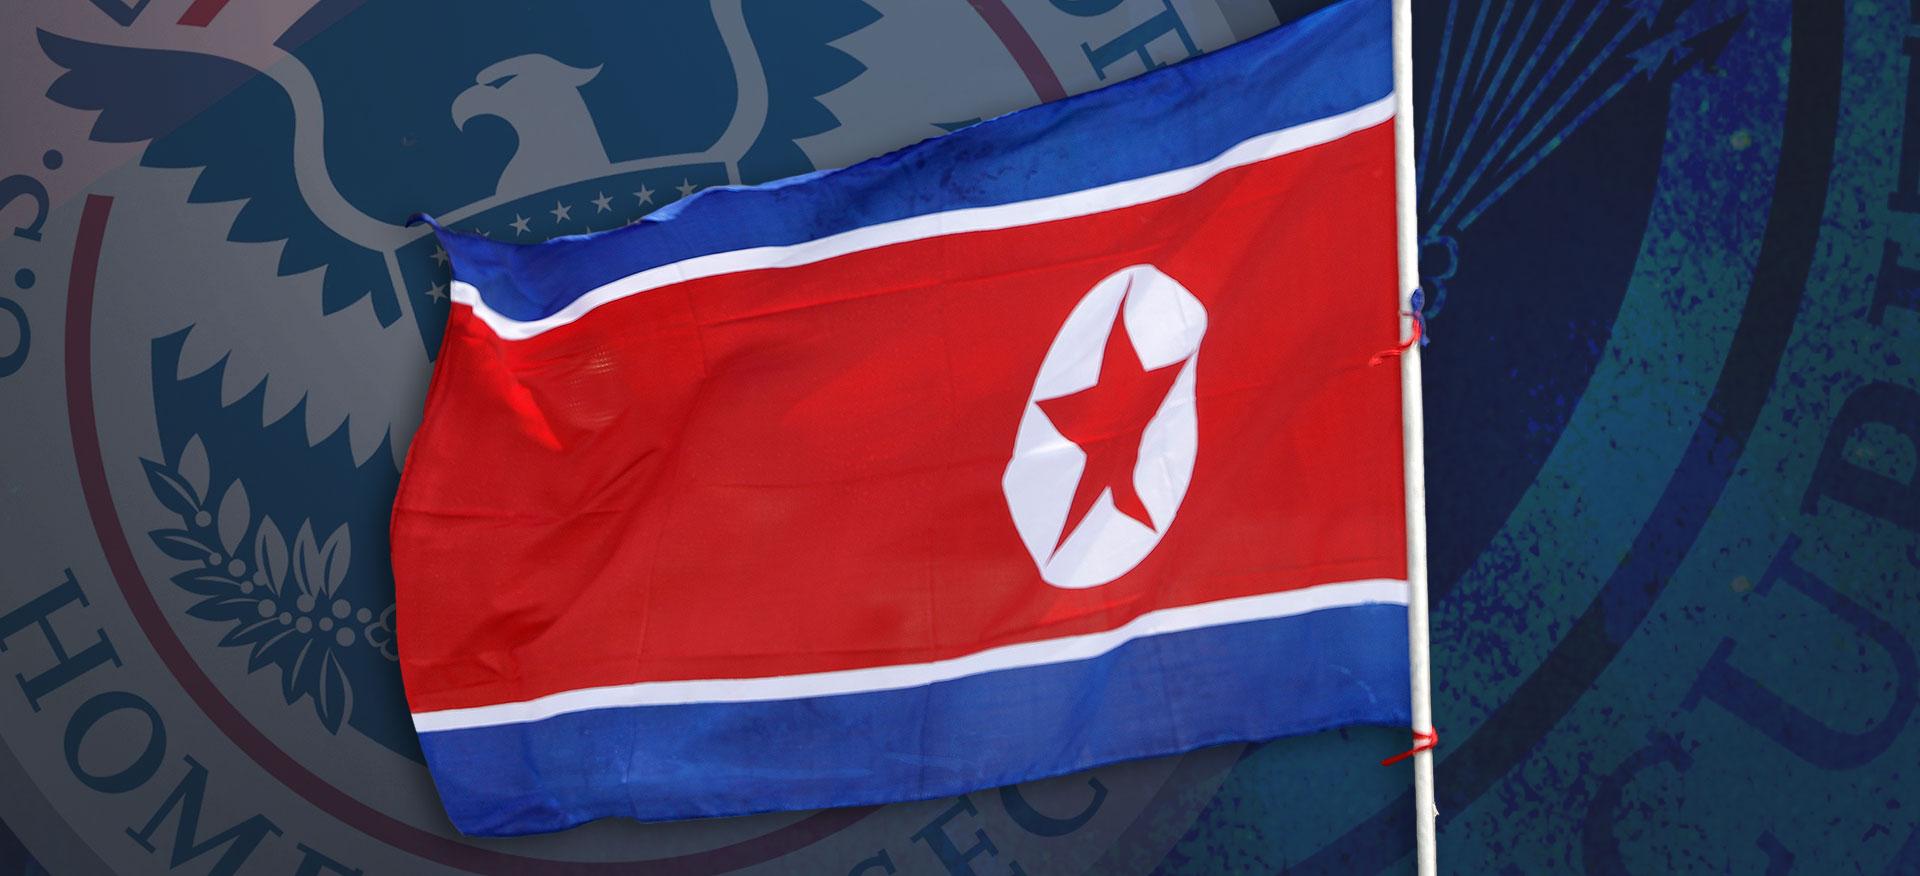 North Korea U.S. Department of Homeland Security ICBM Test American interceptor